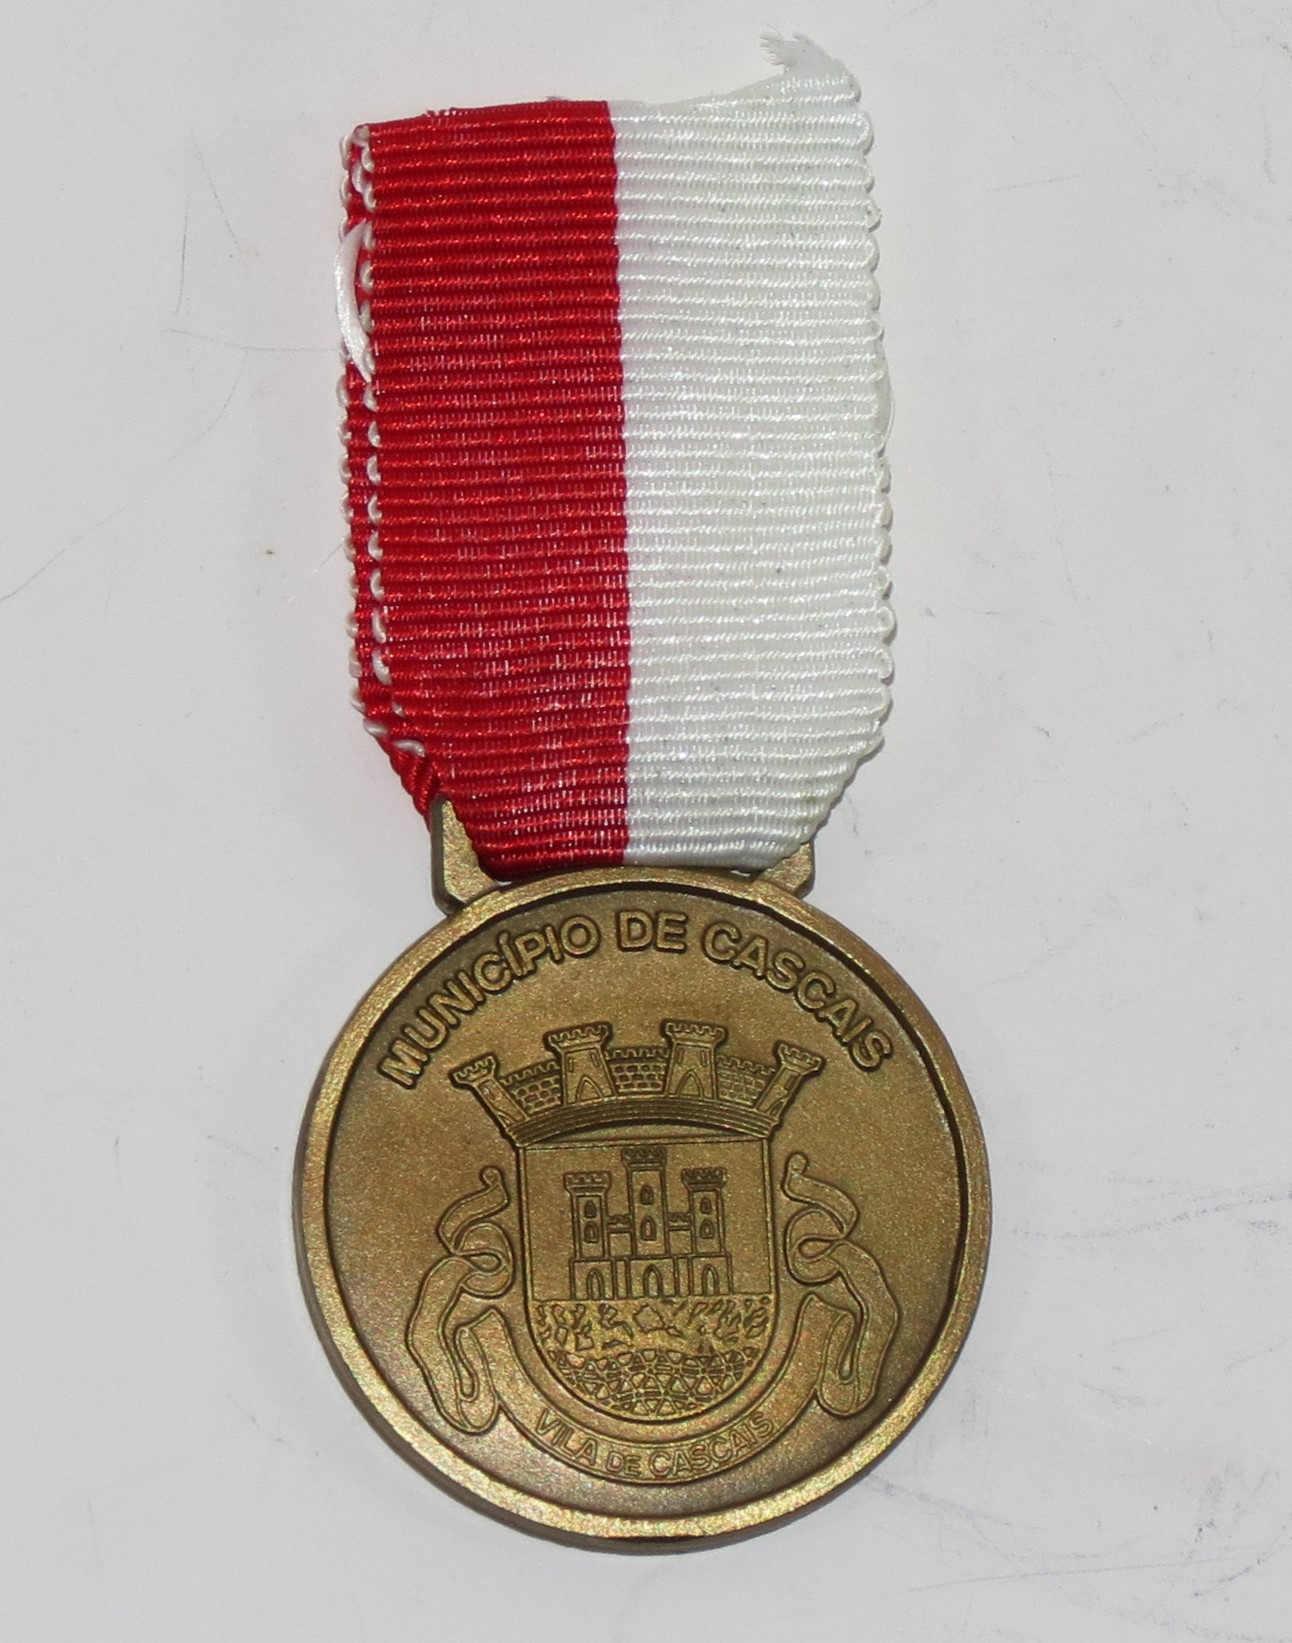 01155 - Medalha